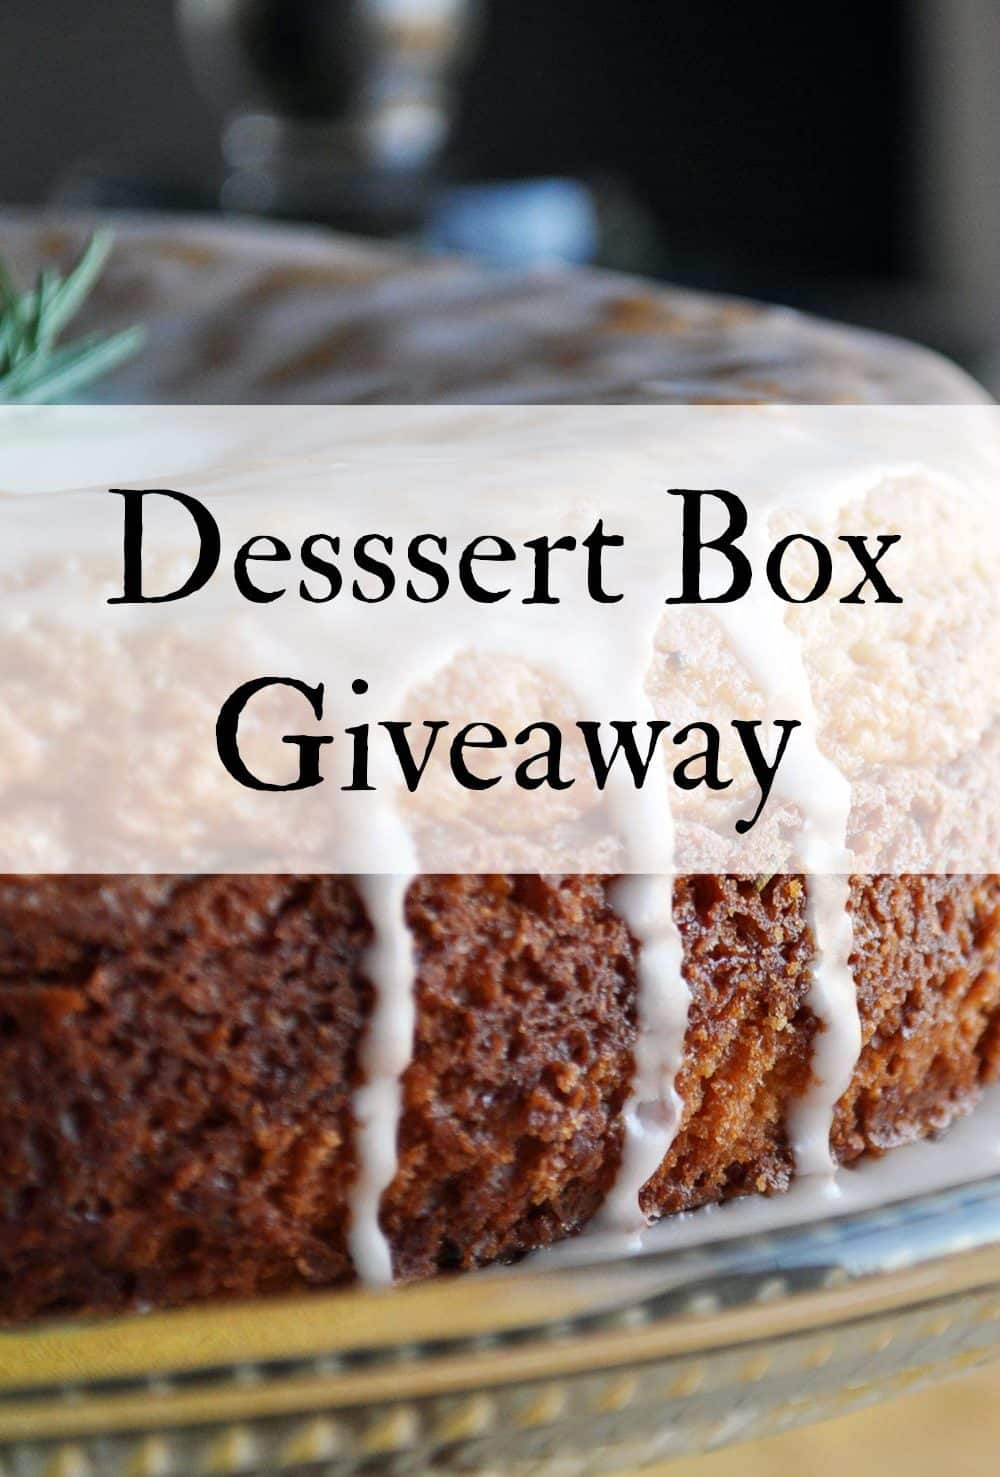 Of Batter and Dough Chef'd giveaway | ofbatteranddough.com